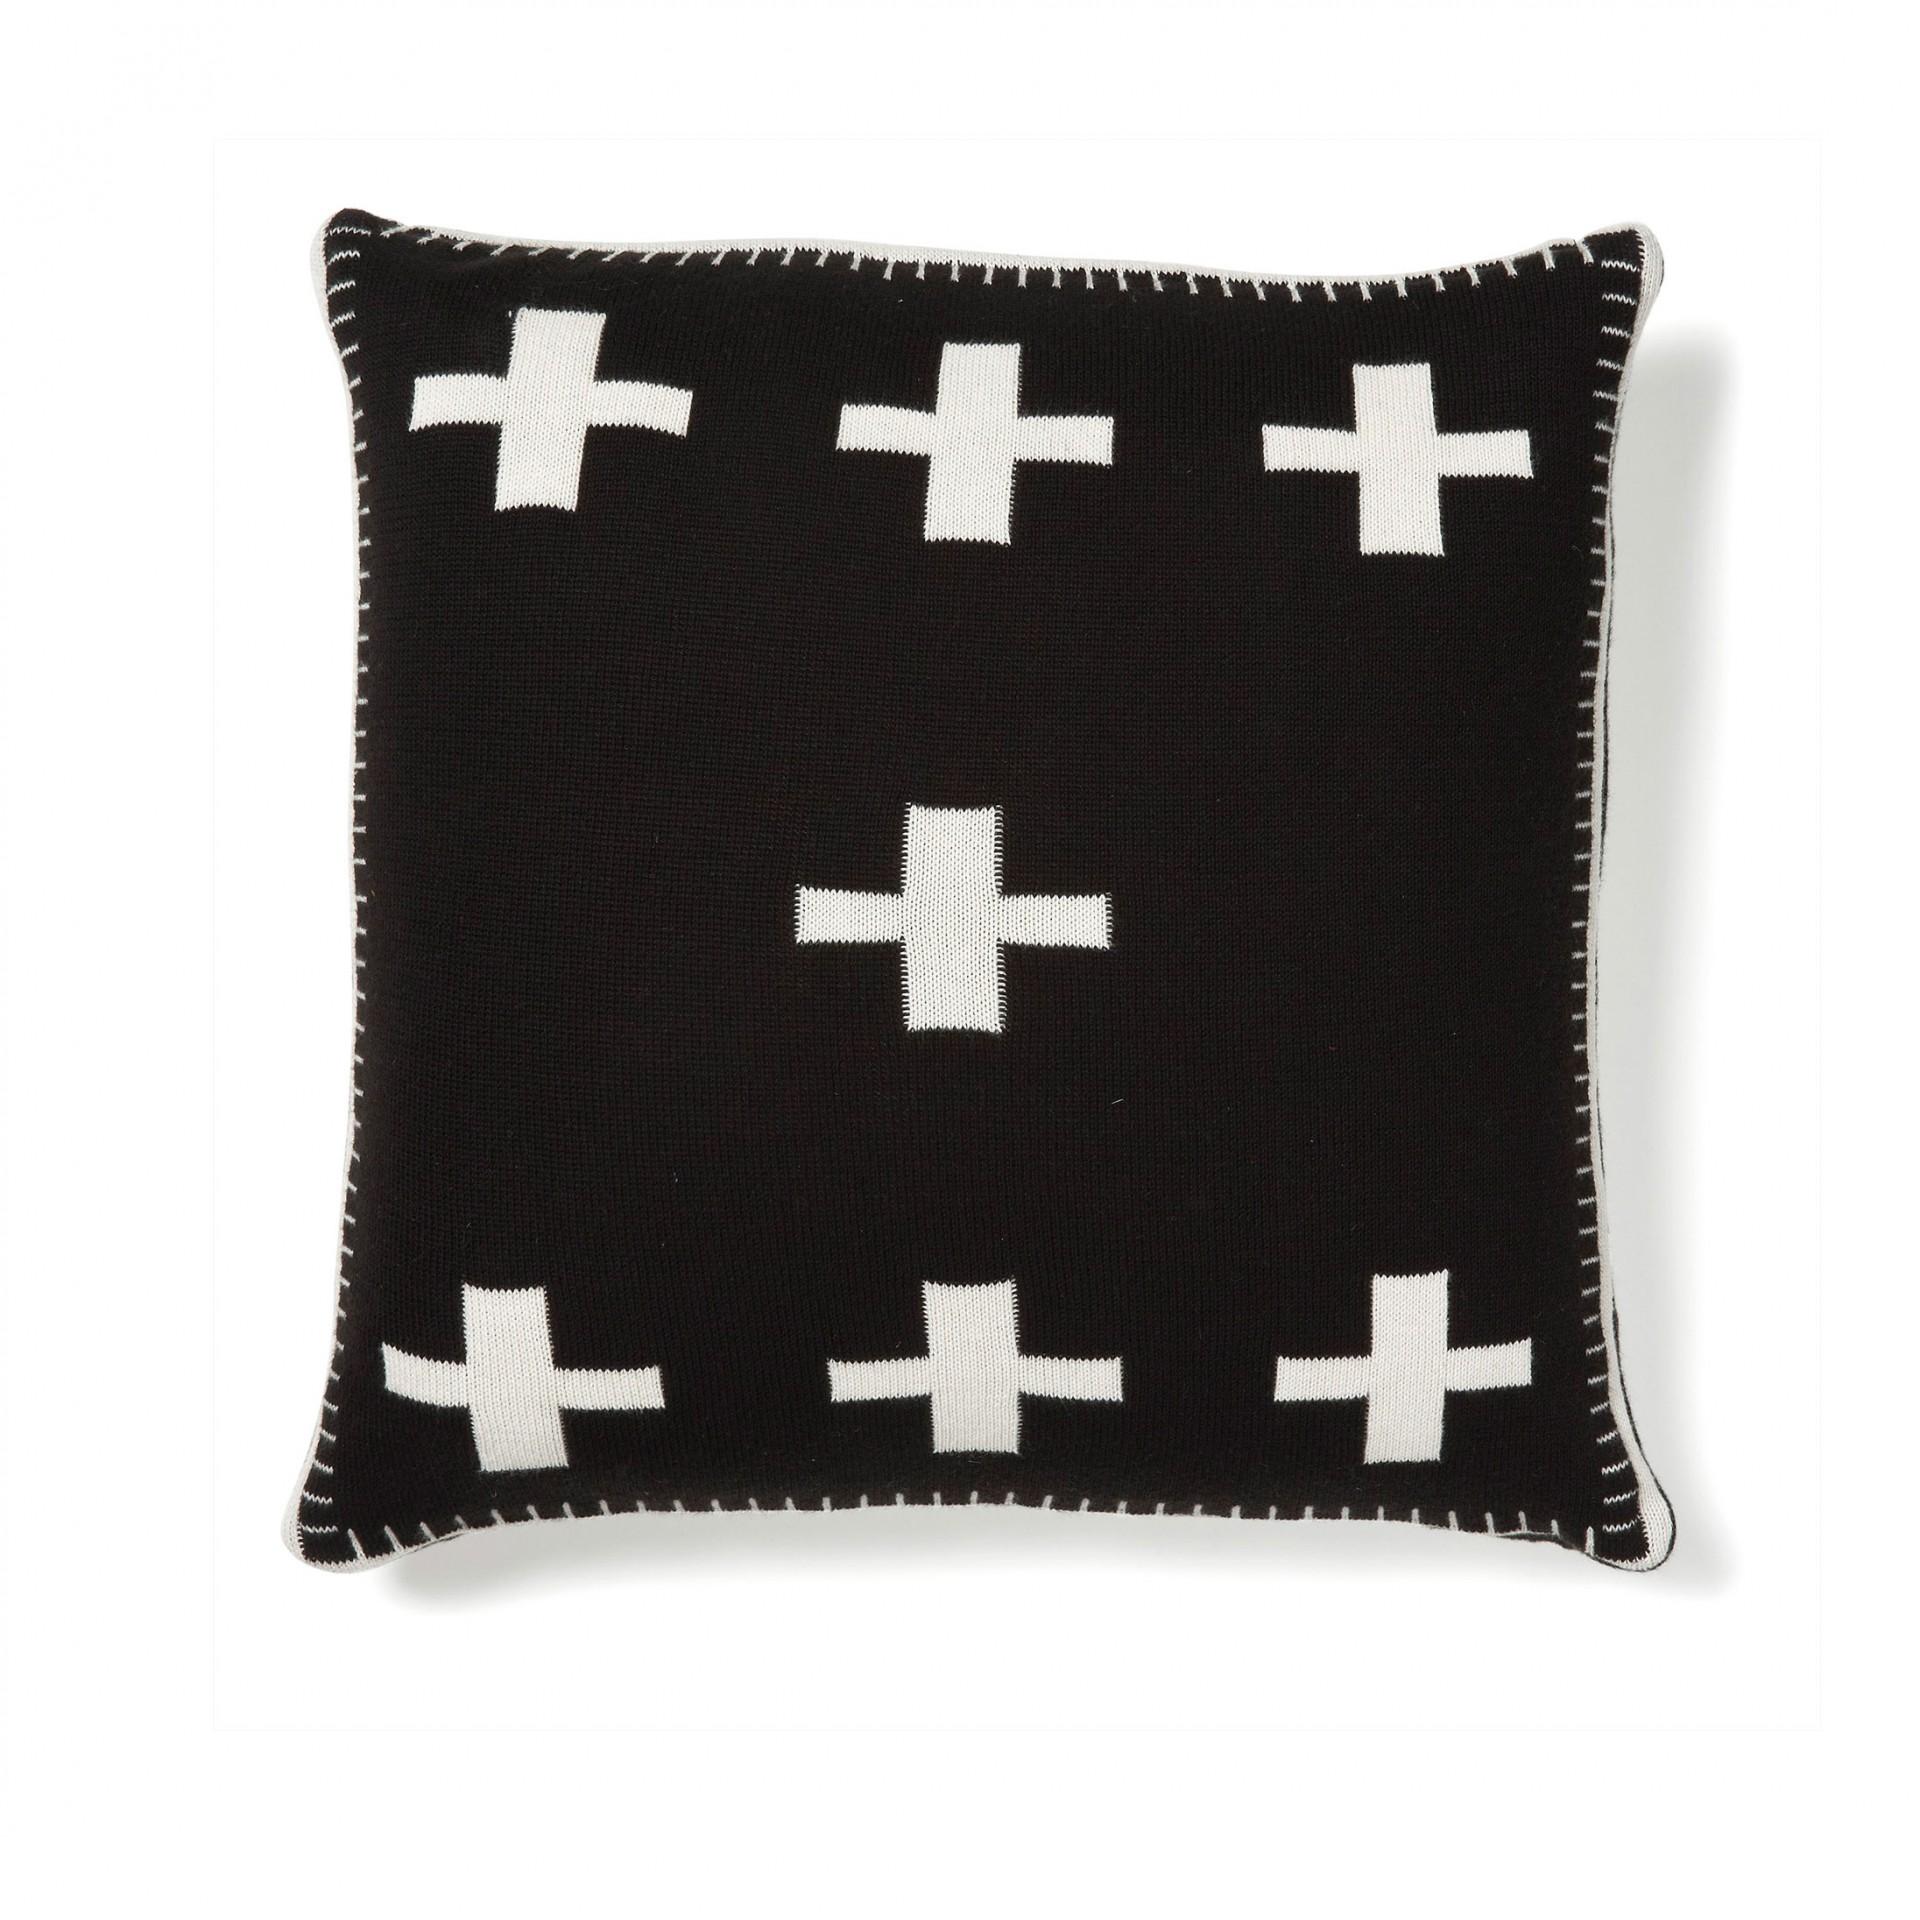 Capa de almofada reversível, preto/branco, 45x45cm